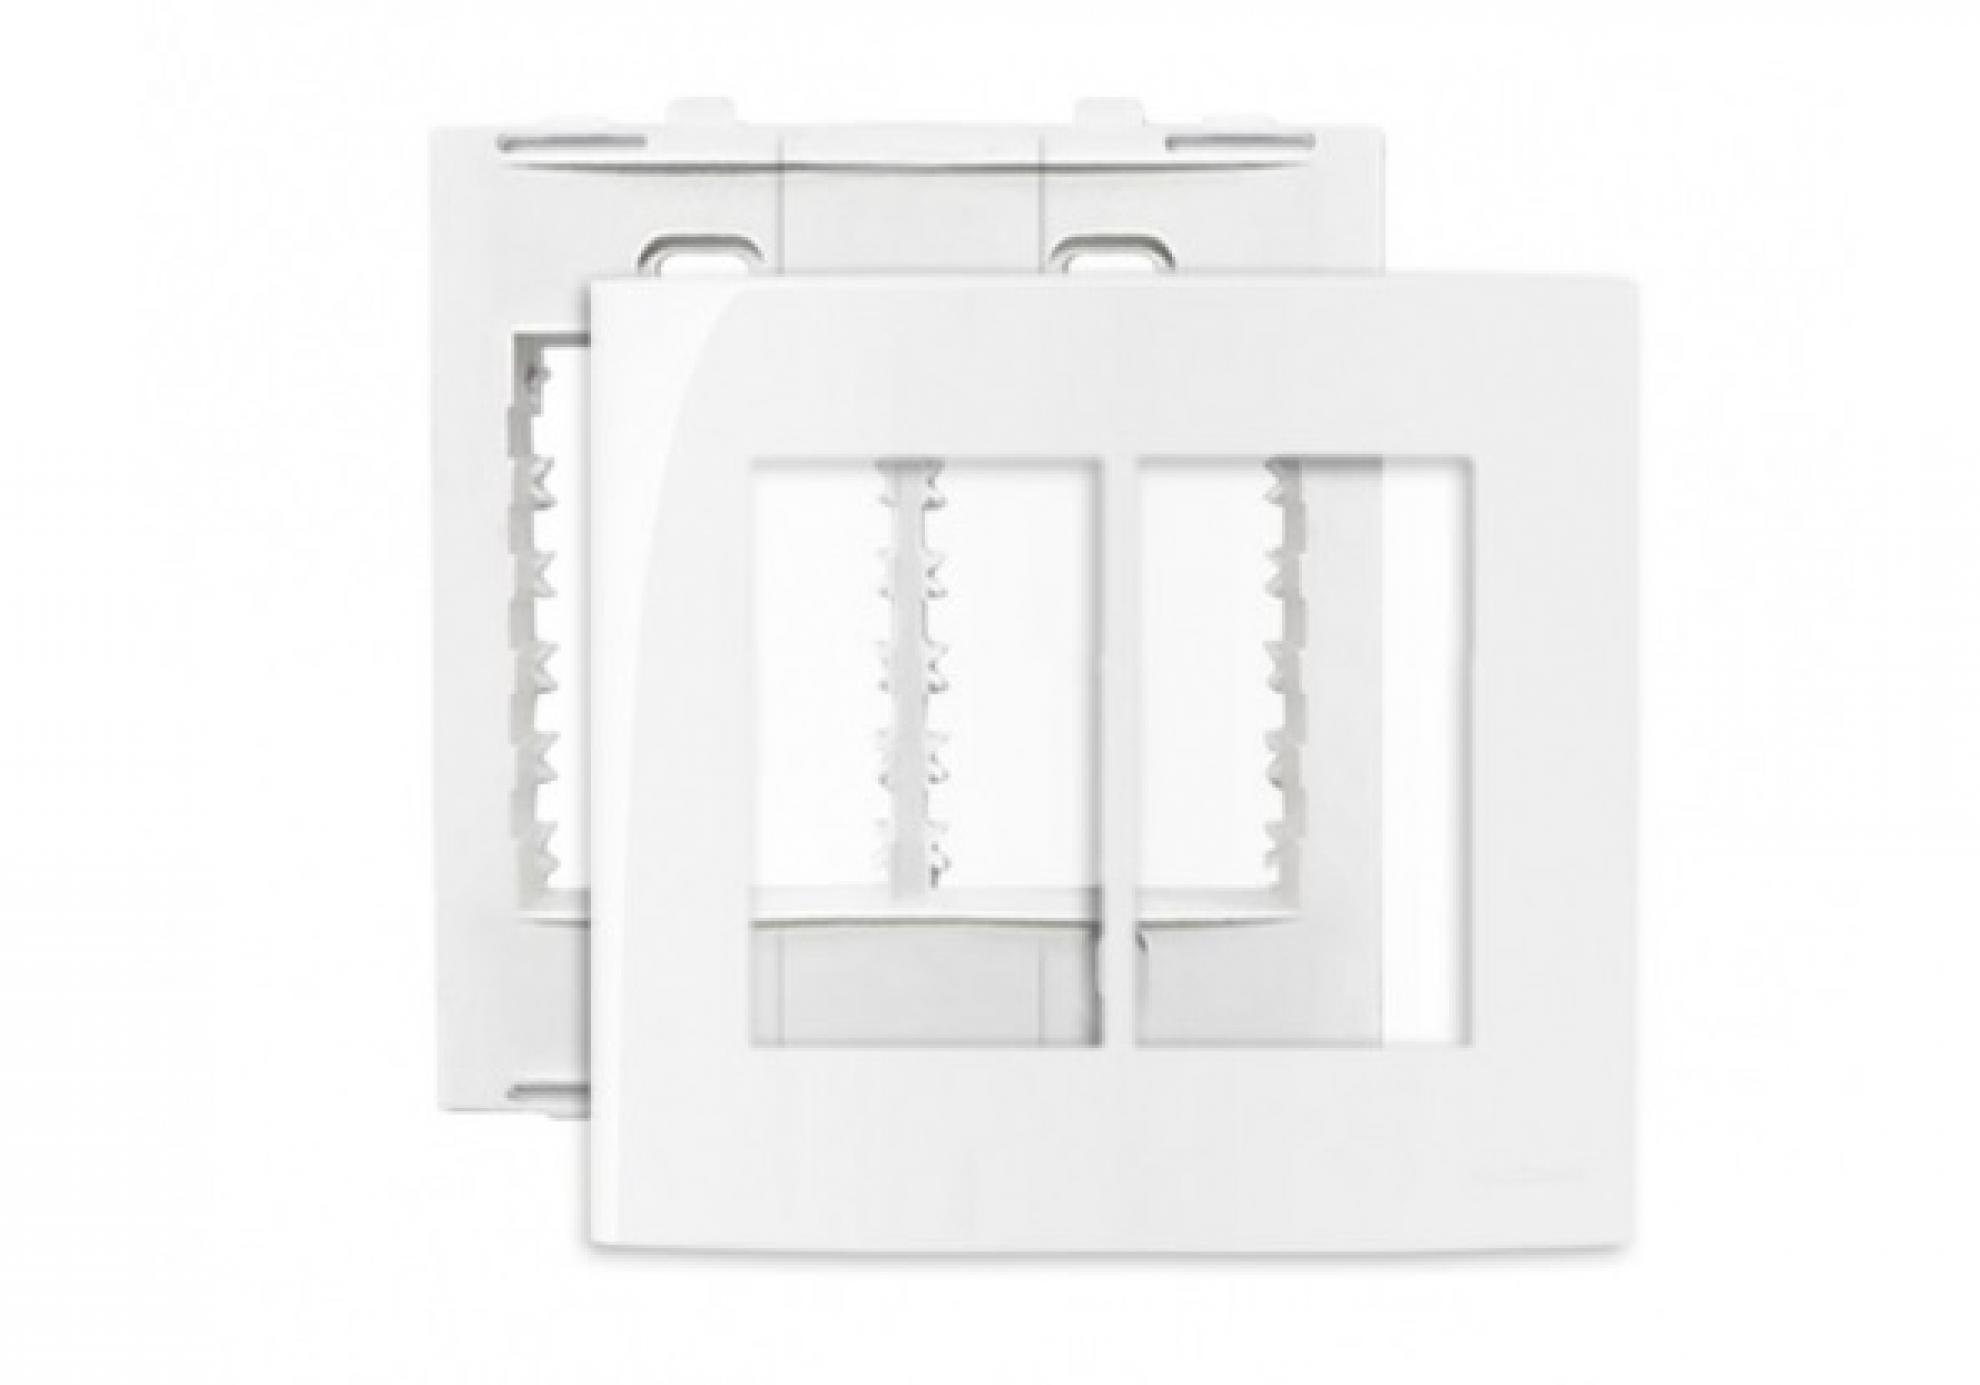 Placa 4X4 6 Postos + Suporte - Branco